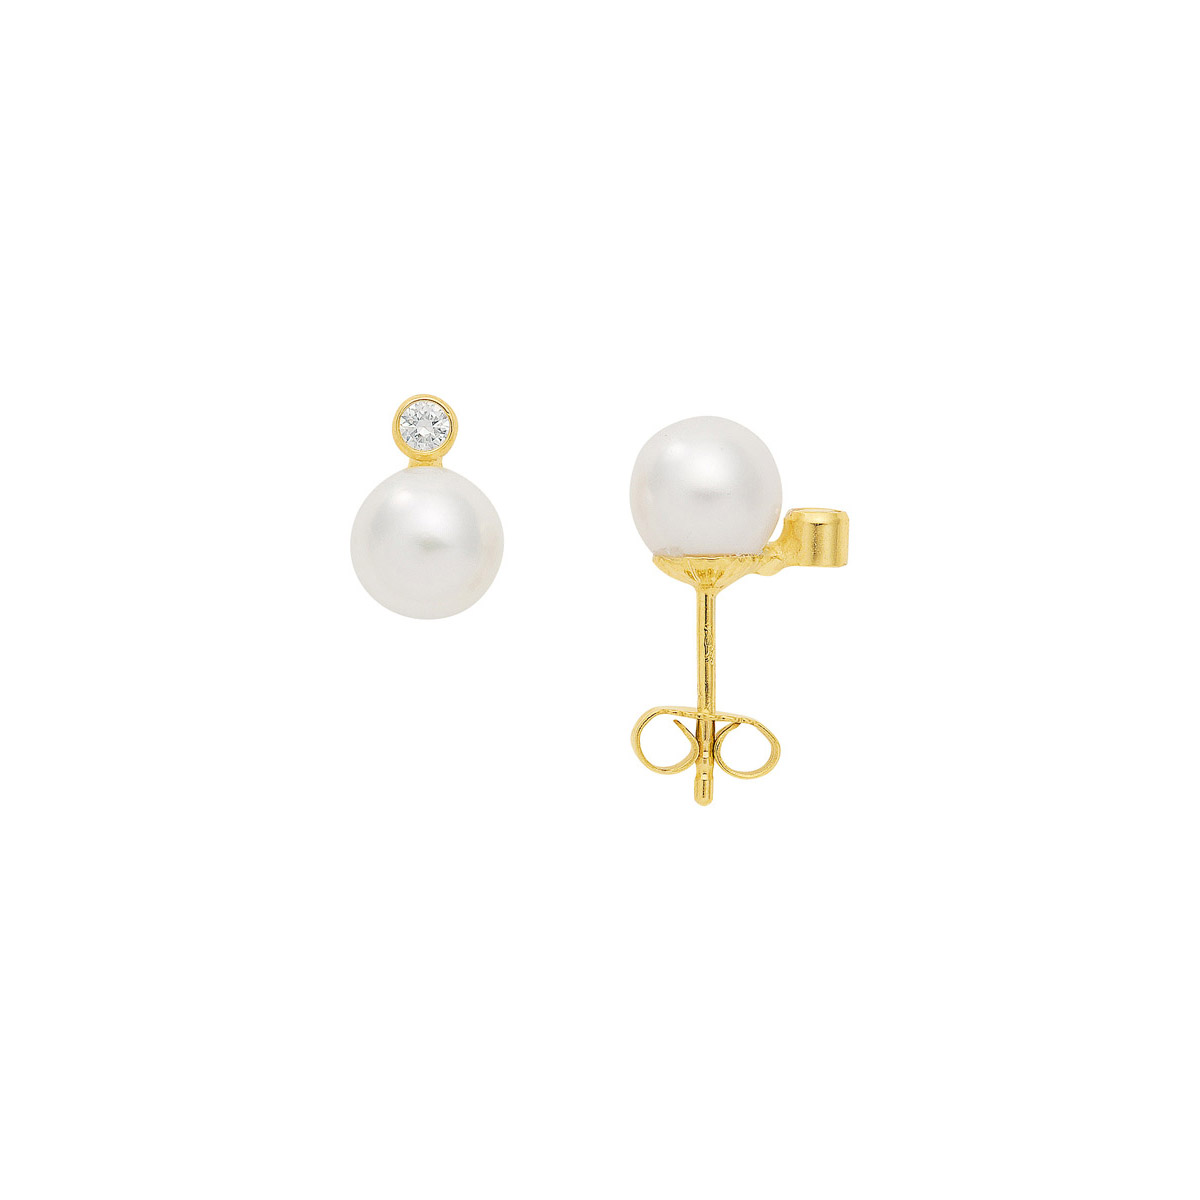 Perleørering med zirkon - Billig Ørestikker med perler til salg